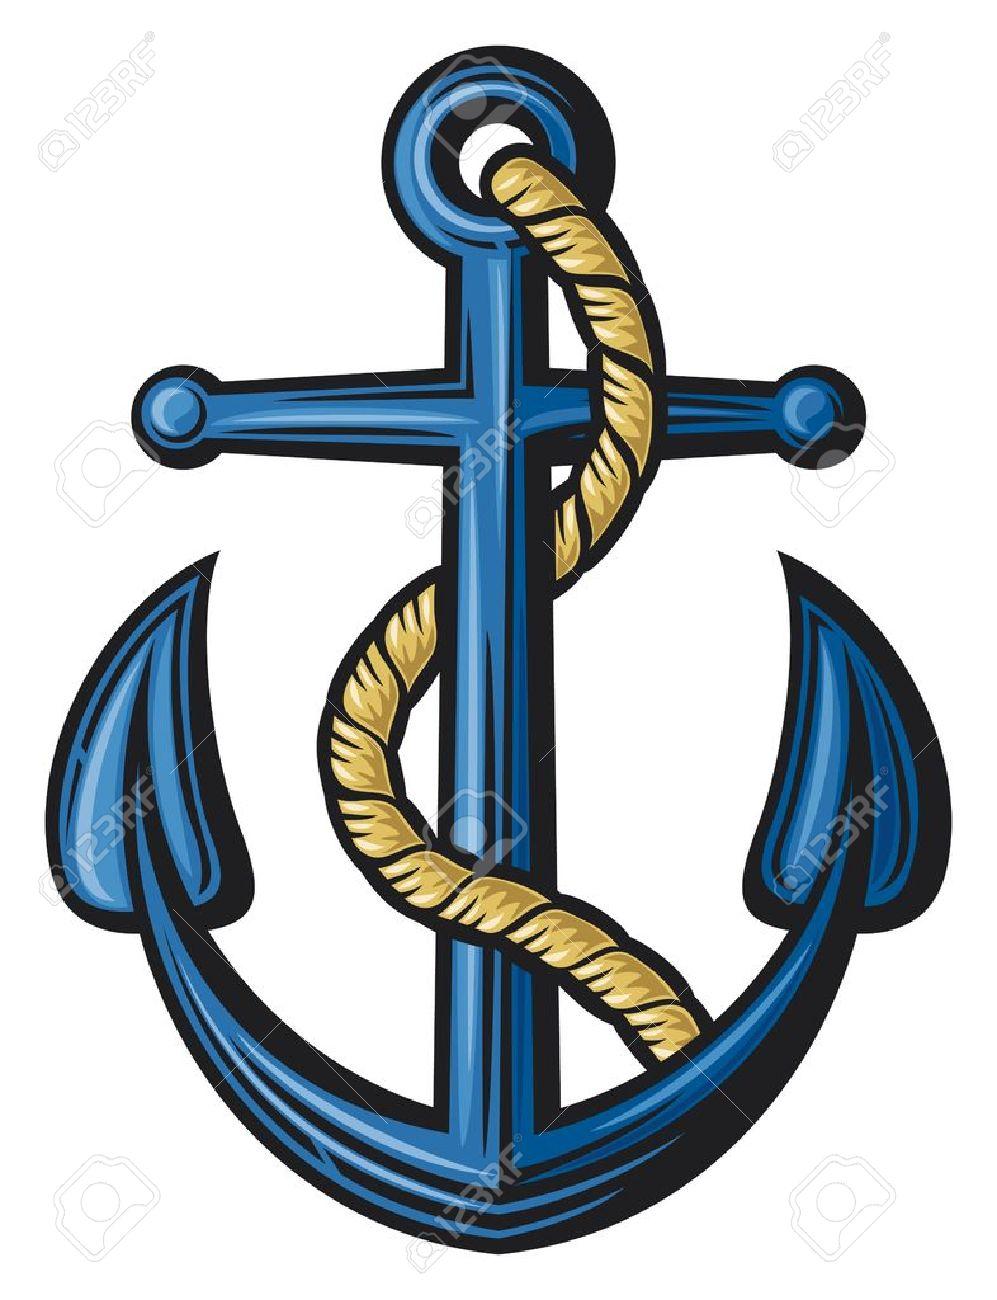 Color art anchorage - Anchorage Anchor Illustration Illustration